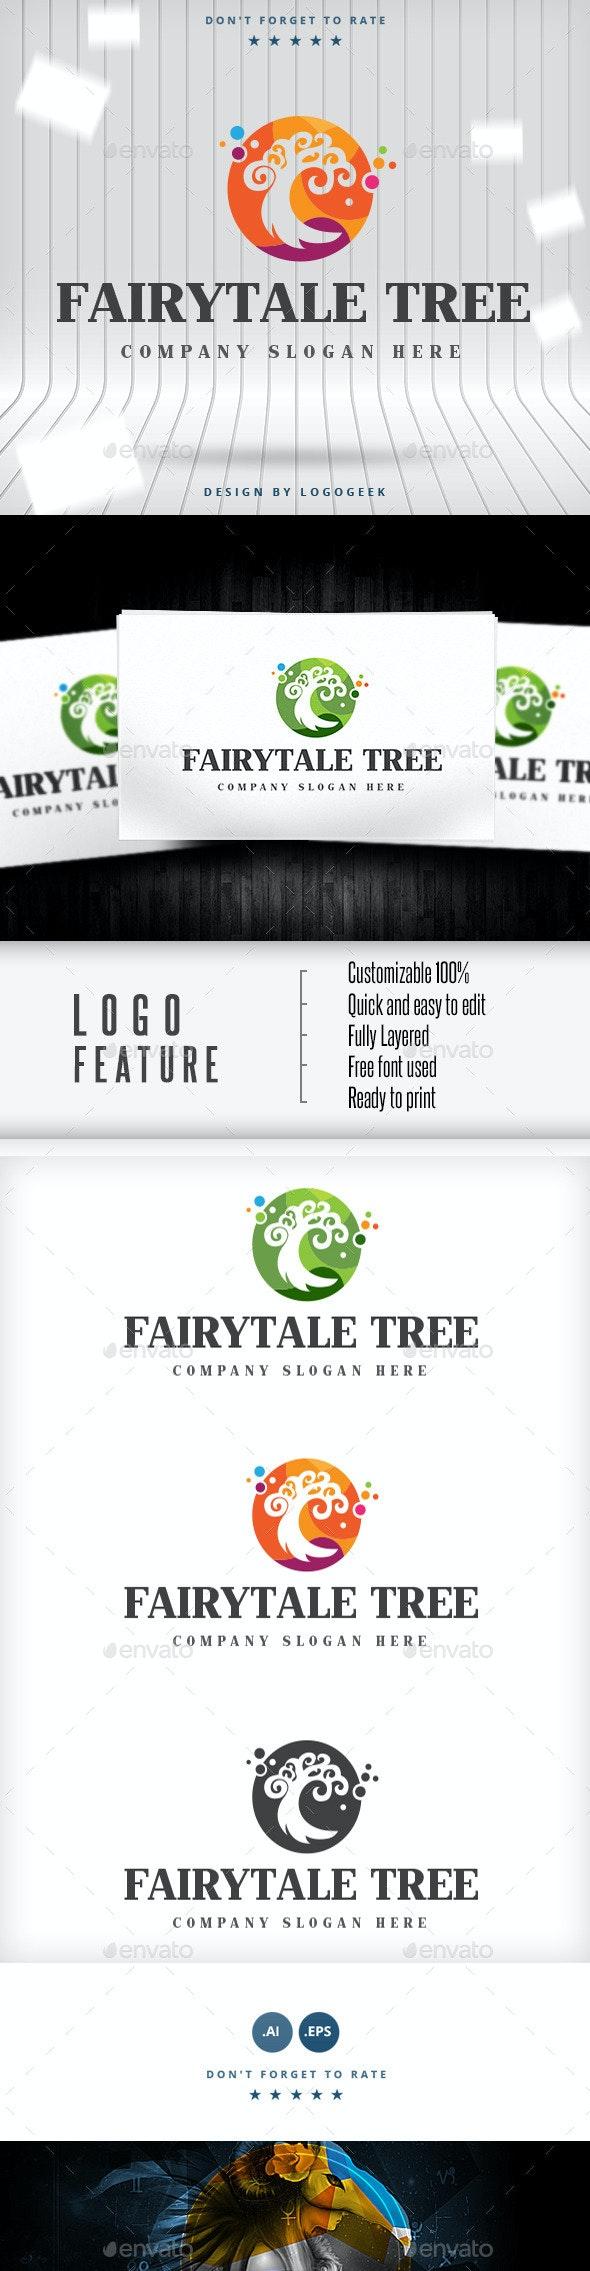 Fairytale Tree Logo - Logo Templates